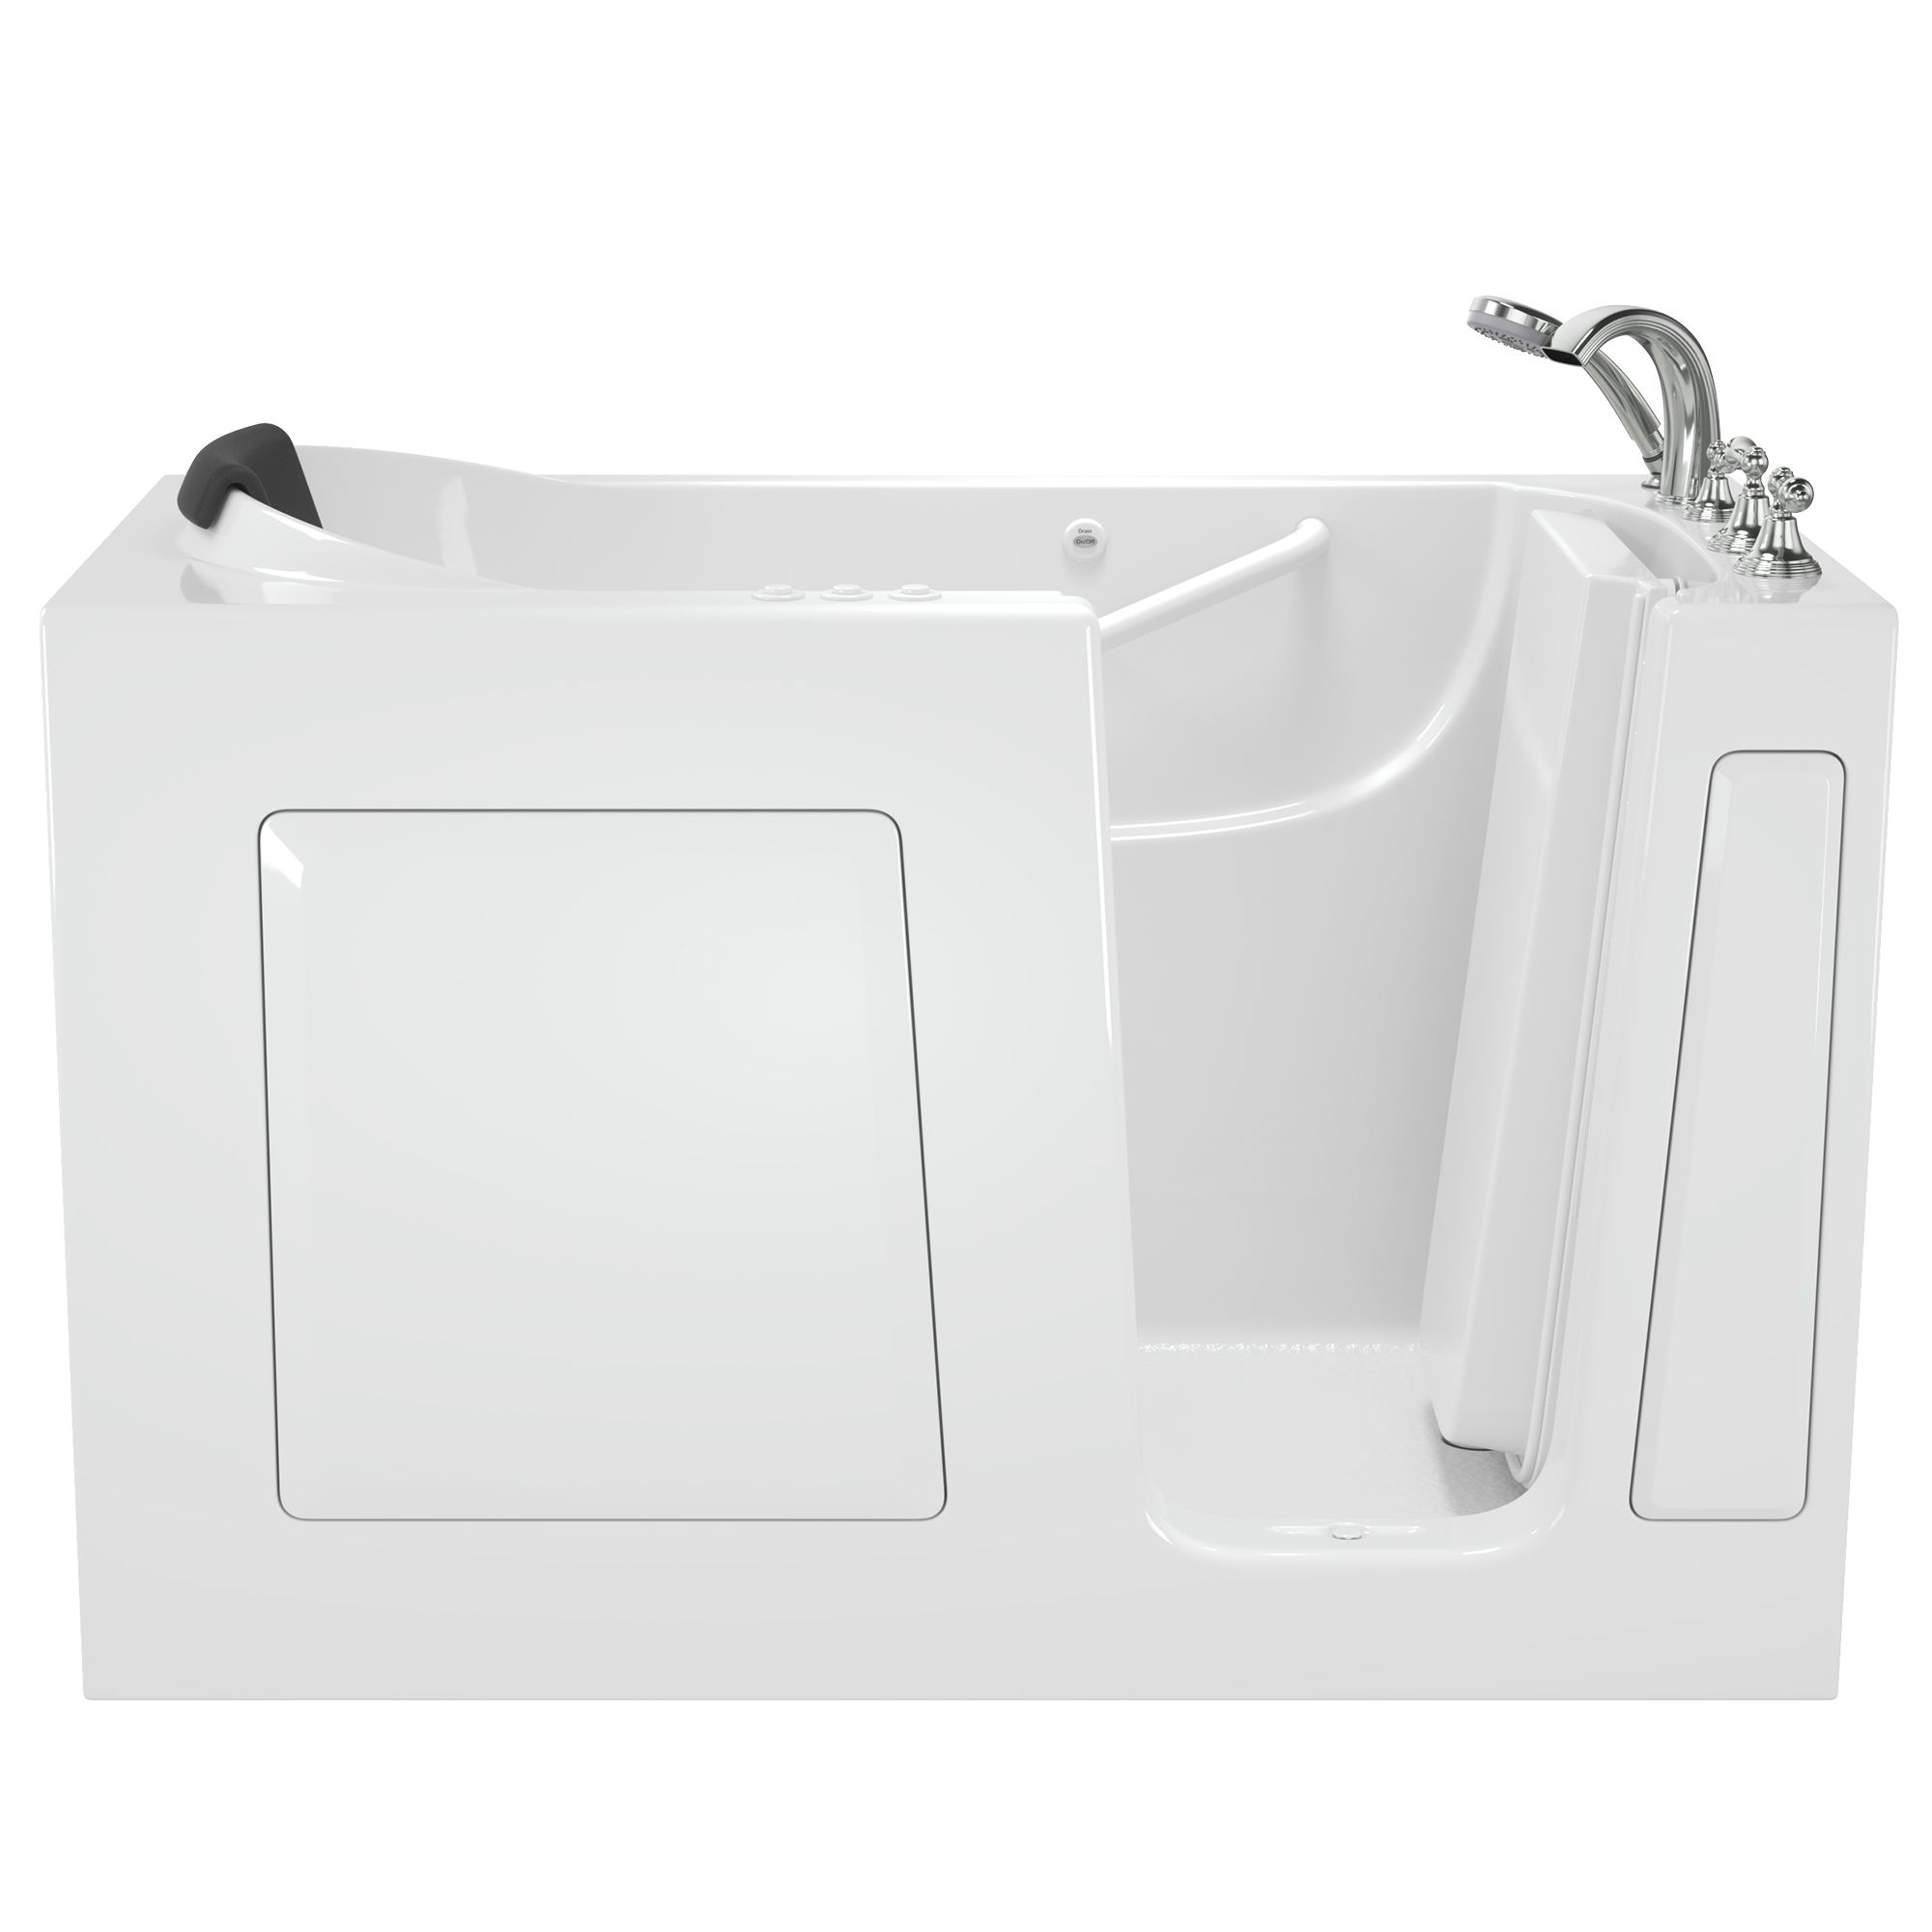 air spa and whirlpool massage bathtub